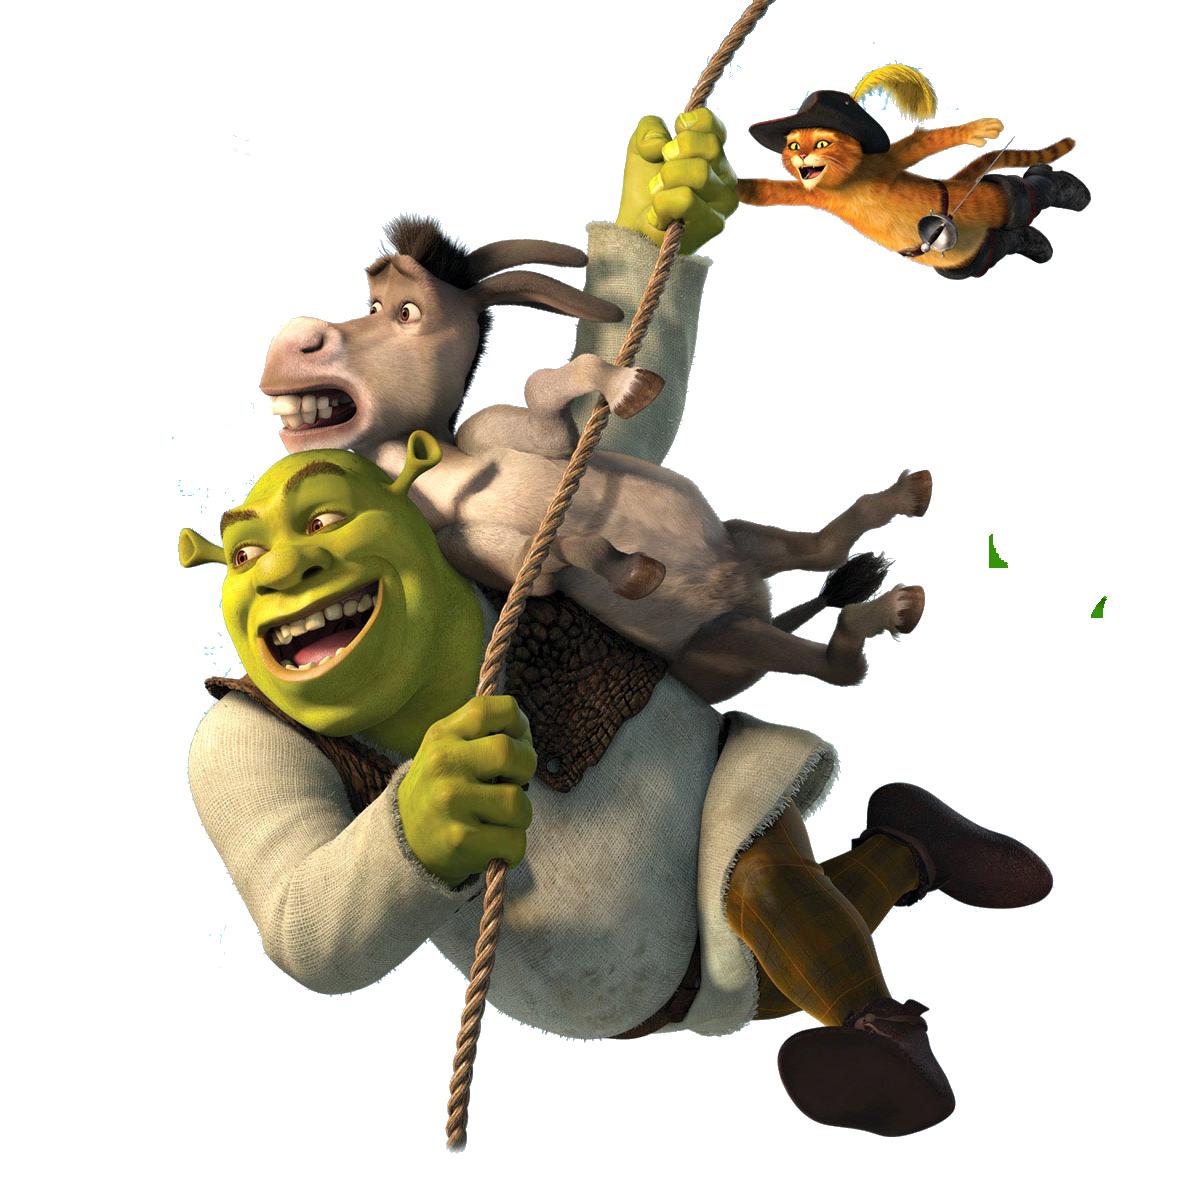 Shrek Character Promo Shrek Fond De Dessin Anime Shrek Personnage